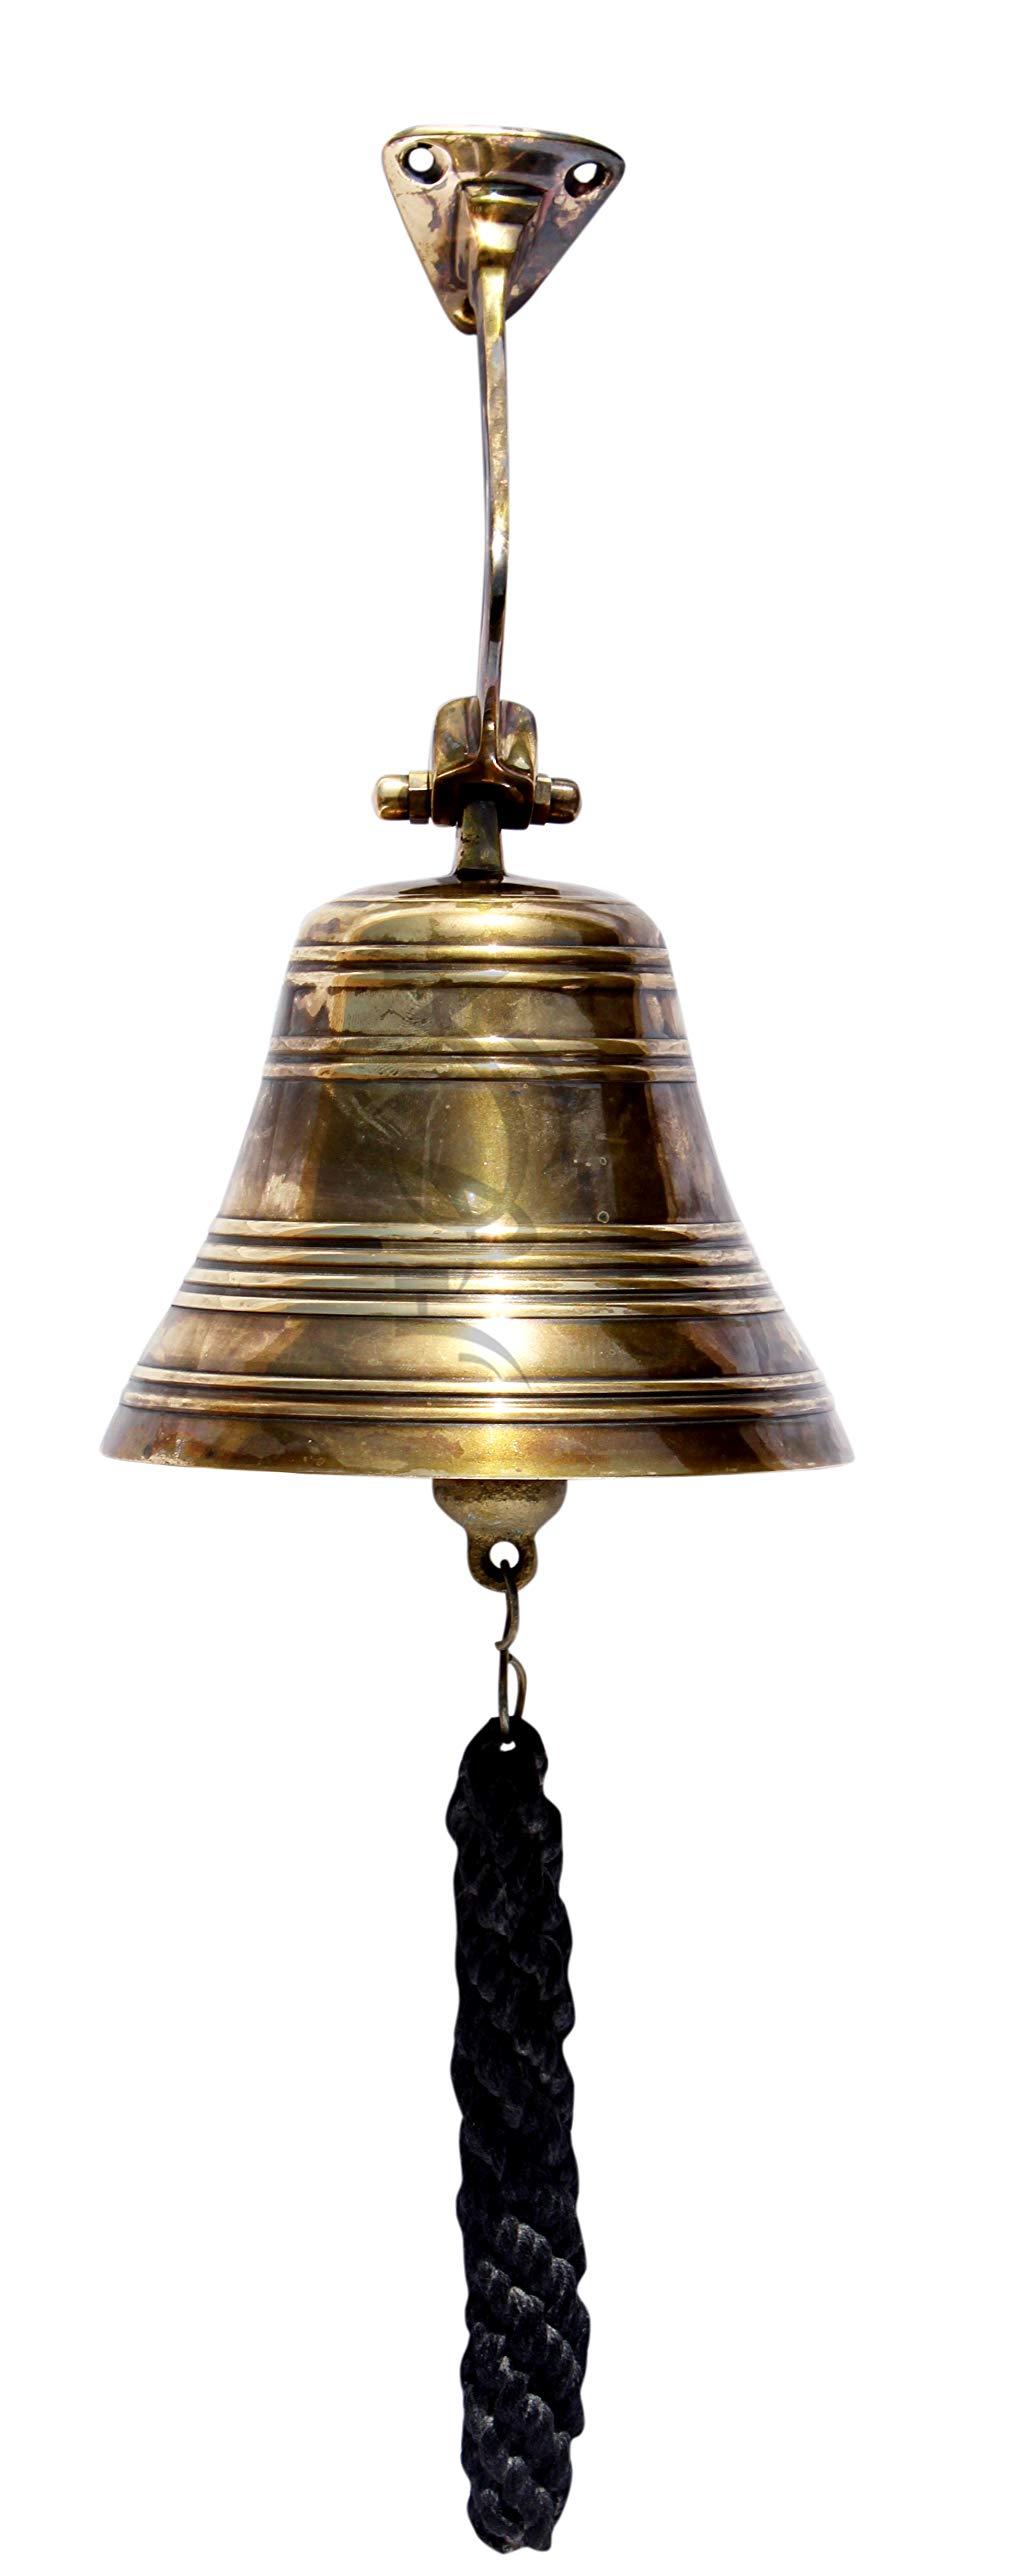 MAH Brass Finish Ship?s Bell Maritime Duty Watch/Indoor/Outdoor/Last Orders/Pub/Door/School/Dinner/Reception Wall Mountable Brass Bell with Wall Mount C-3055